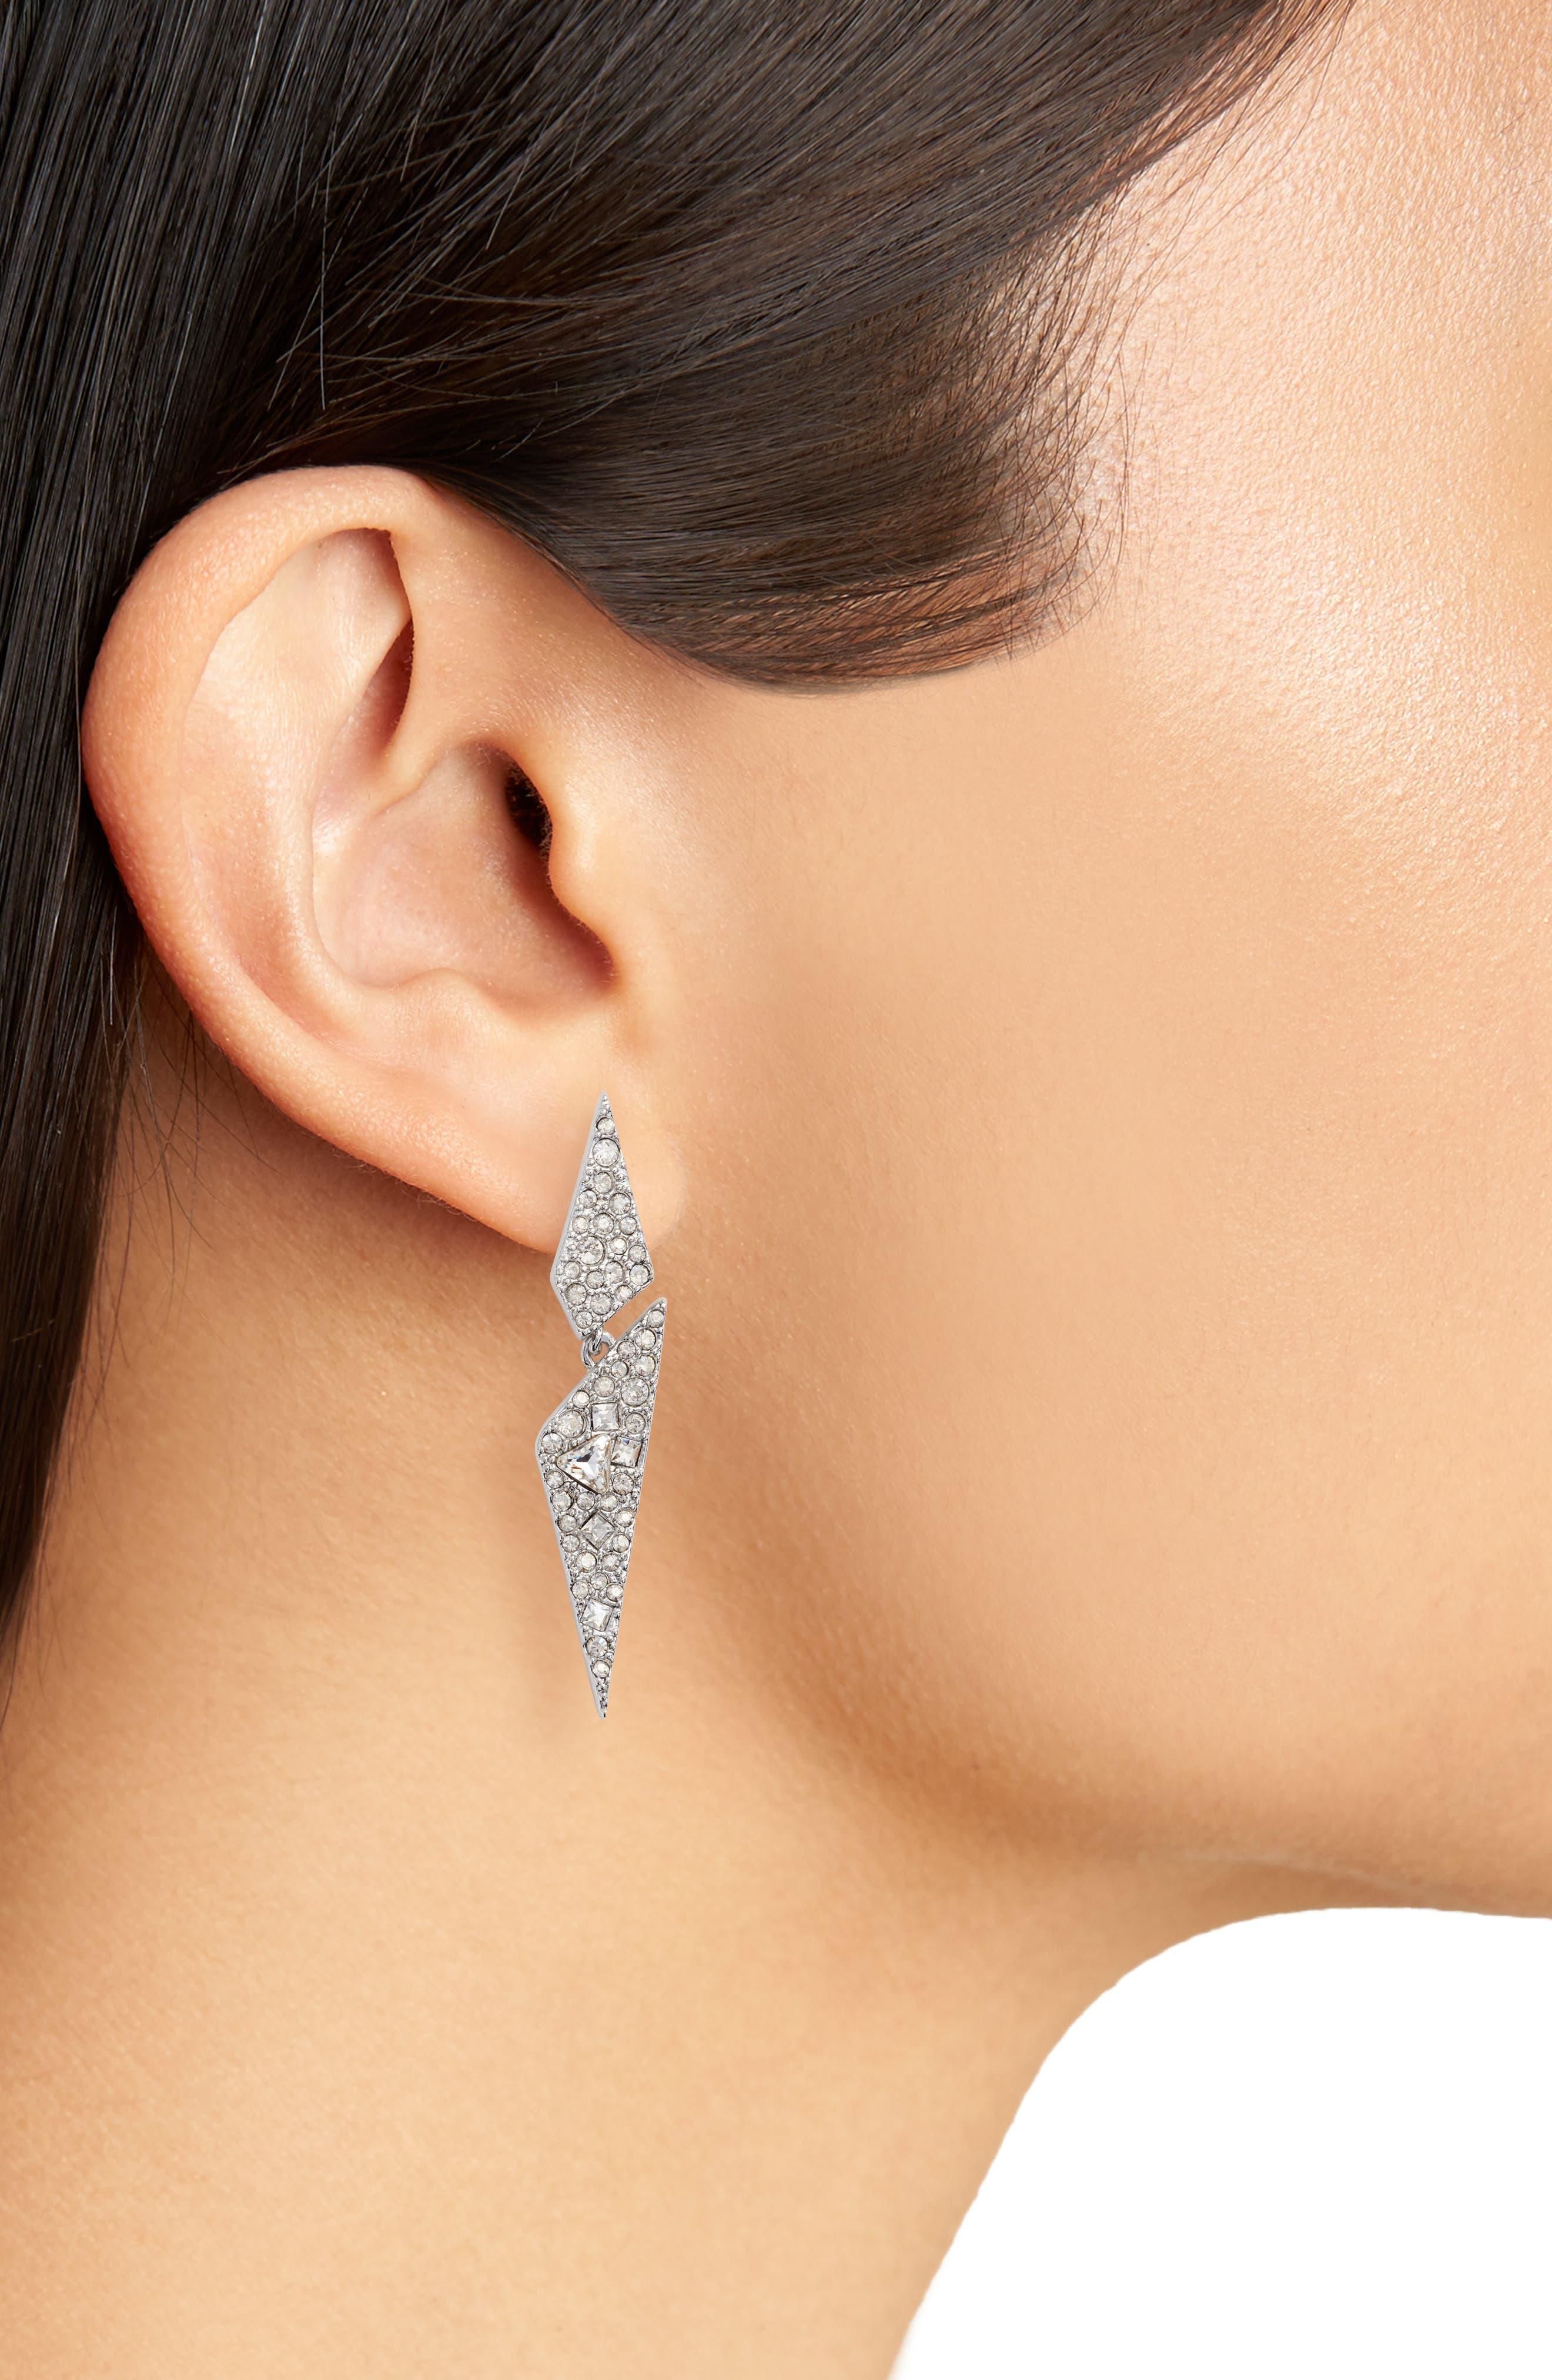 ALEXIS BITTAR,                             Crystal Encrusted Dangling Drop Earrings,                             Alternate thumbnail 2, color,                             710